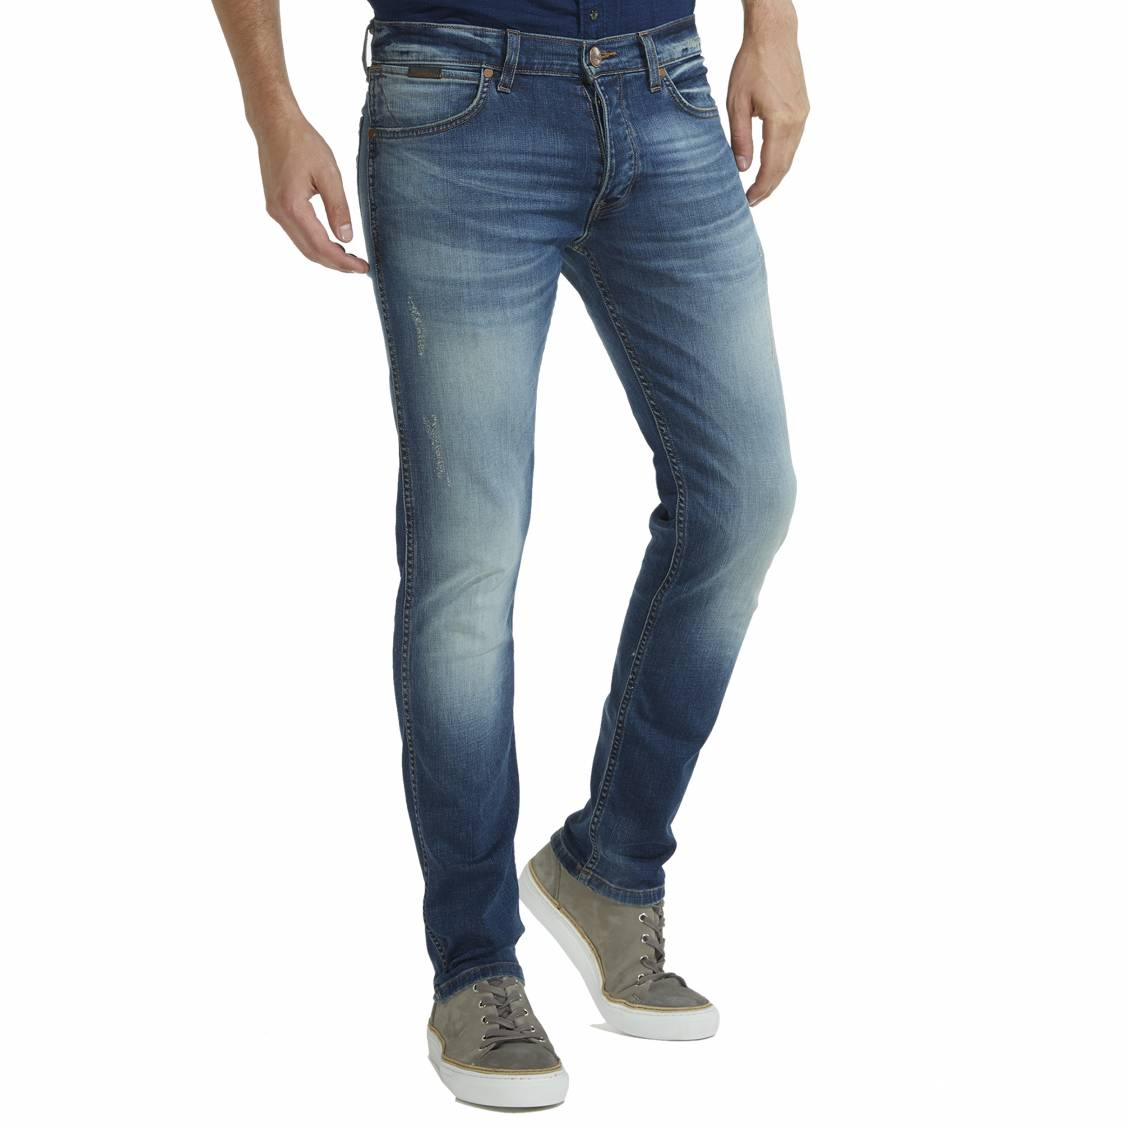 jeans taille basse homme jeans homme homme tous les. Black Bedroom Furniture Sets. Home Design Ideas